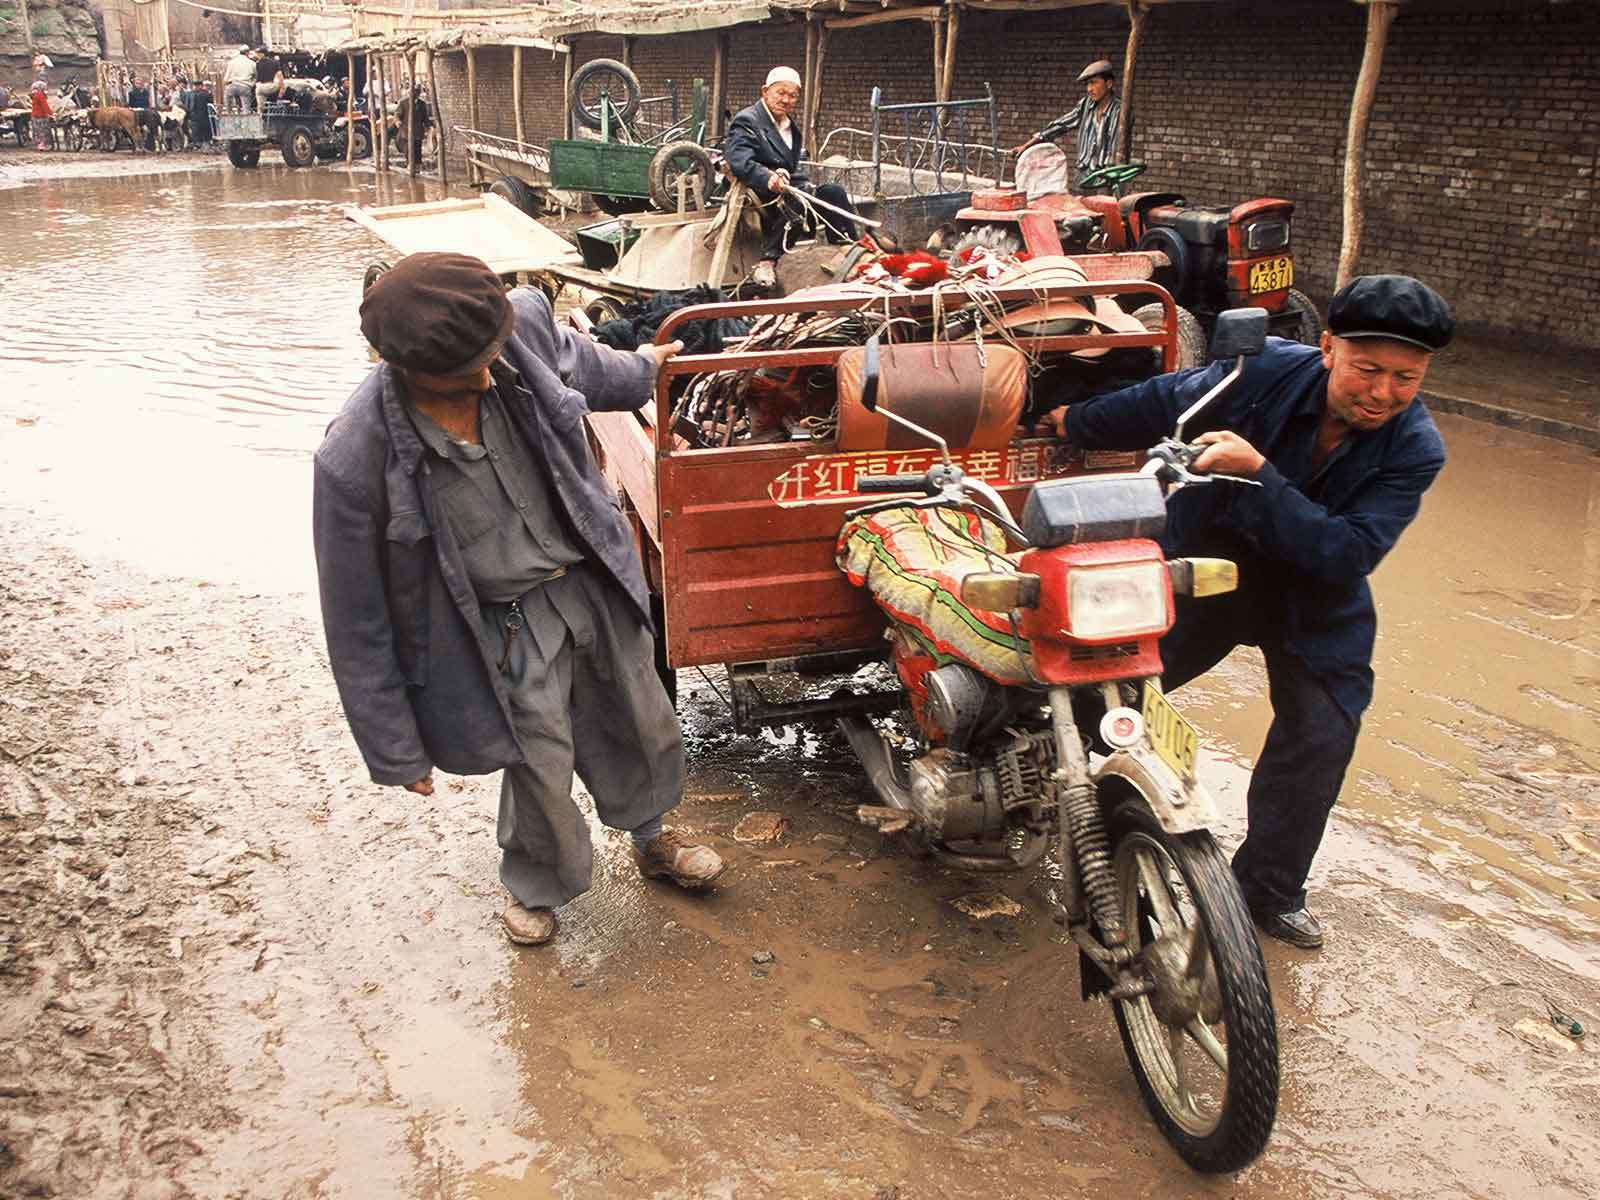 Kashgar Bazaar photo journal - China Silk Road - Dr Steven Andrew Martin - Study Abroad